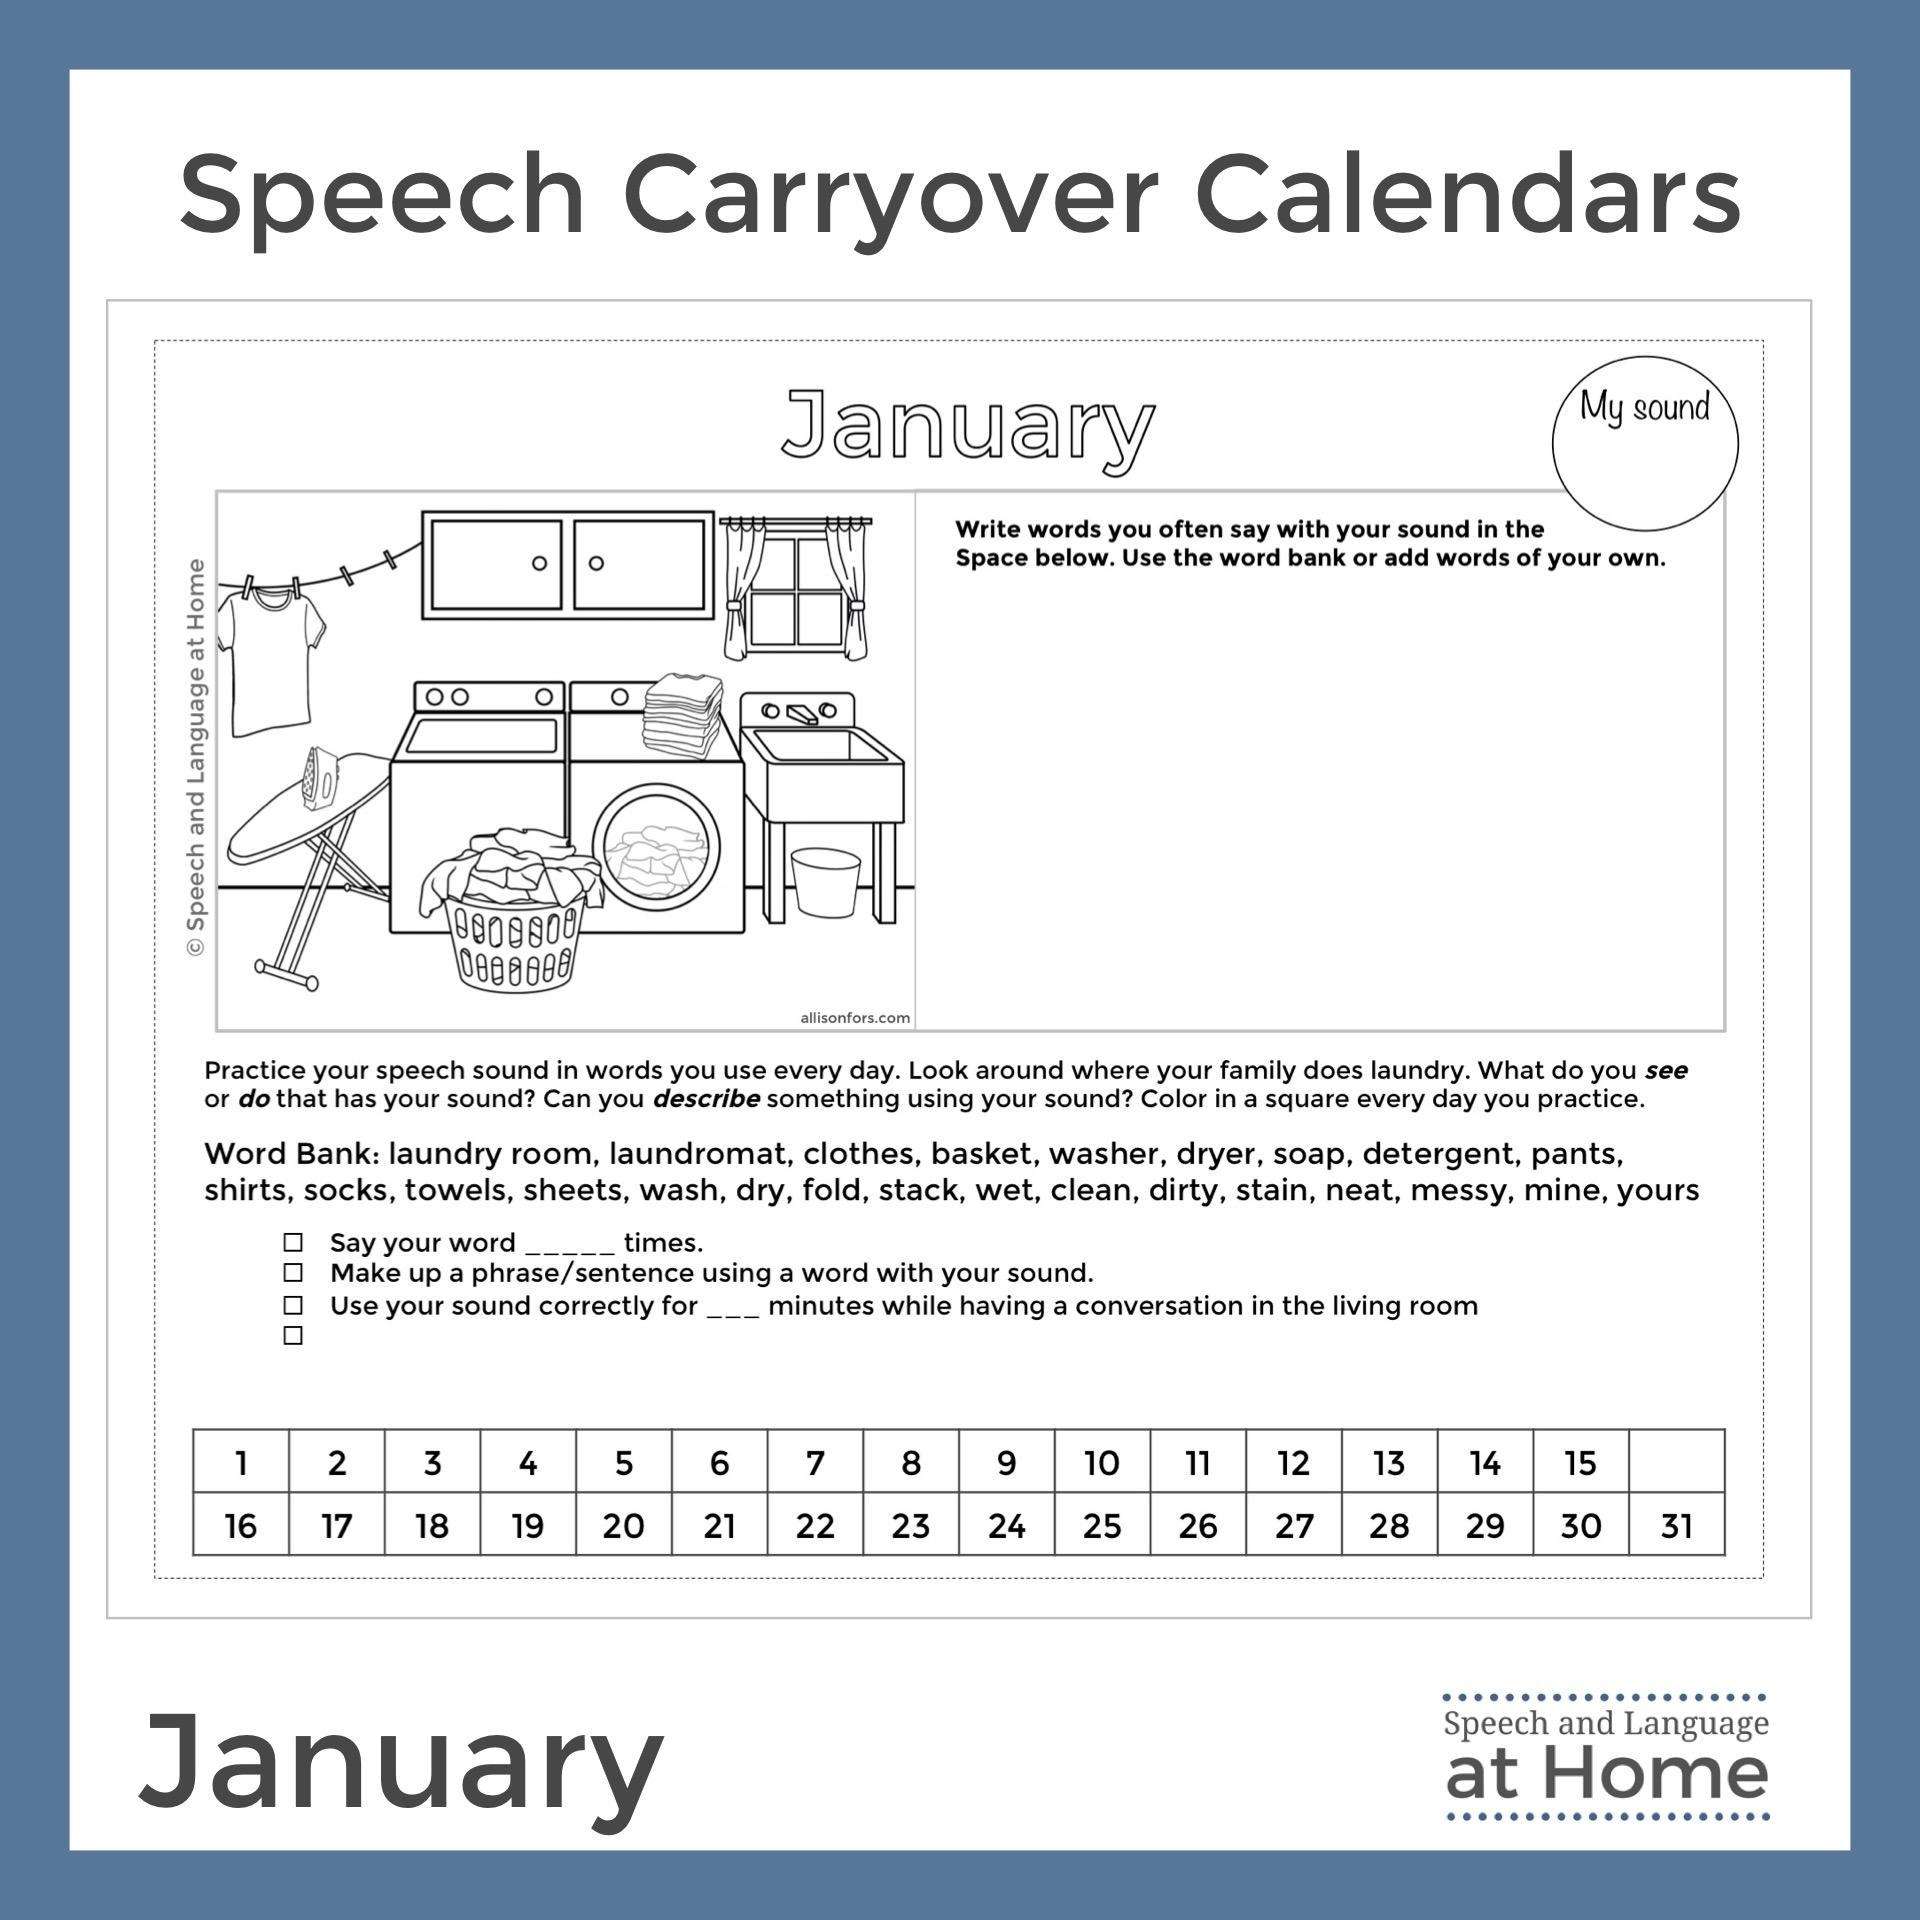 Speech Carryover Calendars Speech and Language at Home January.jpg